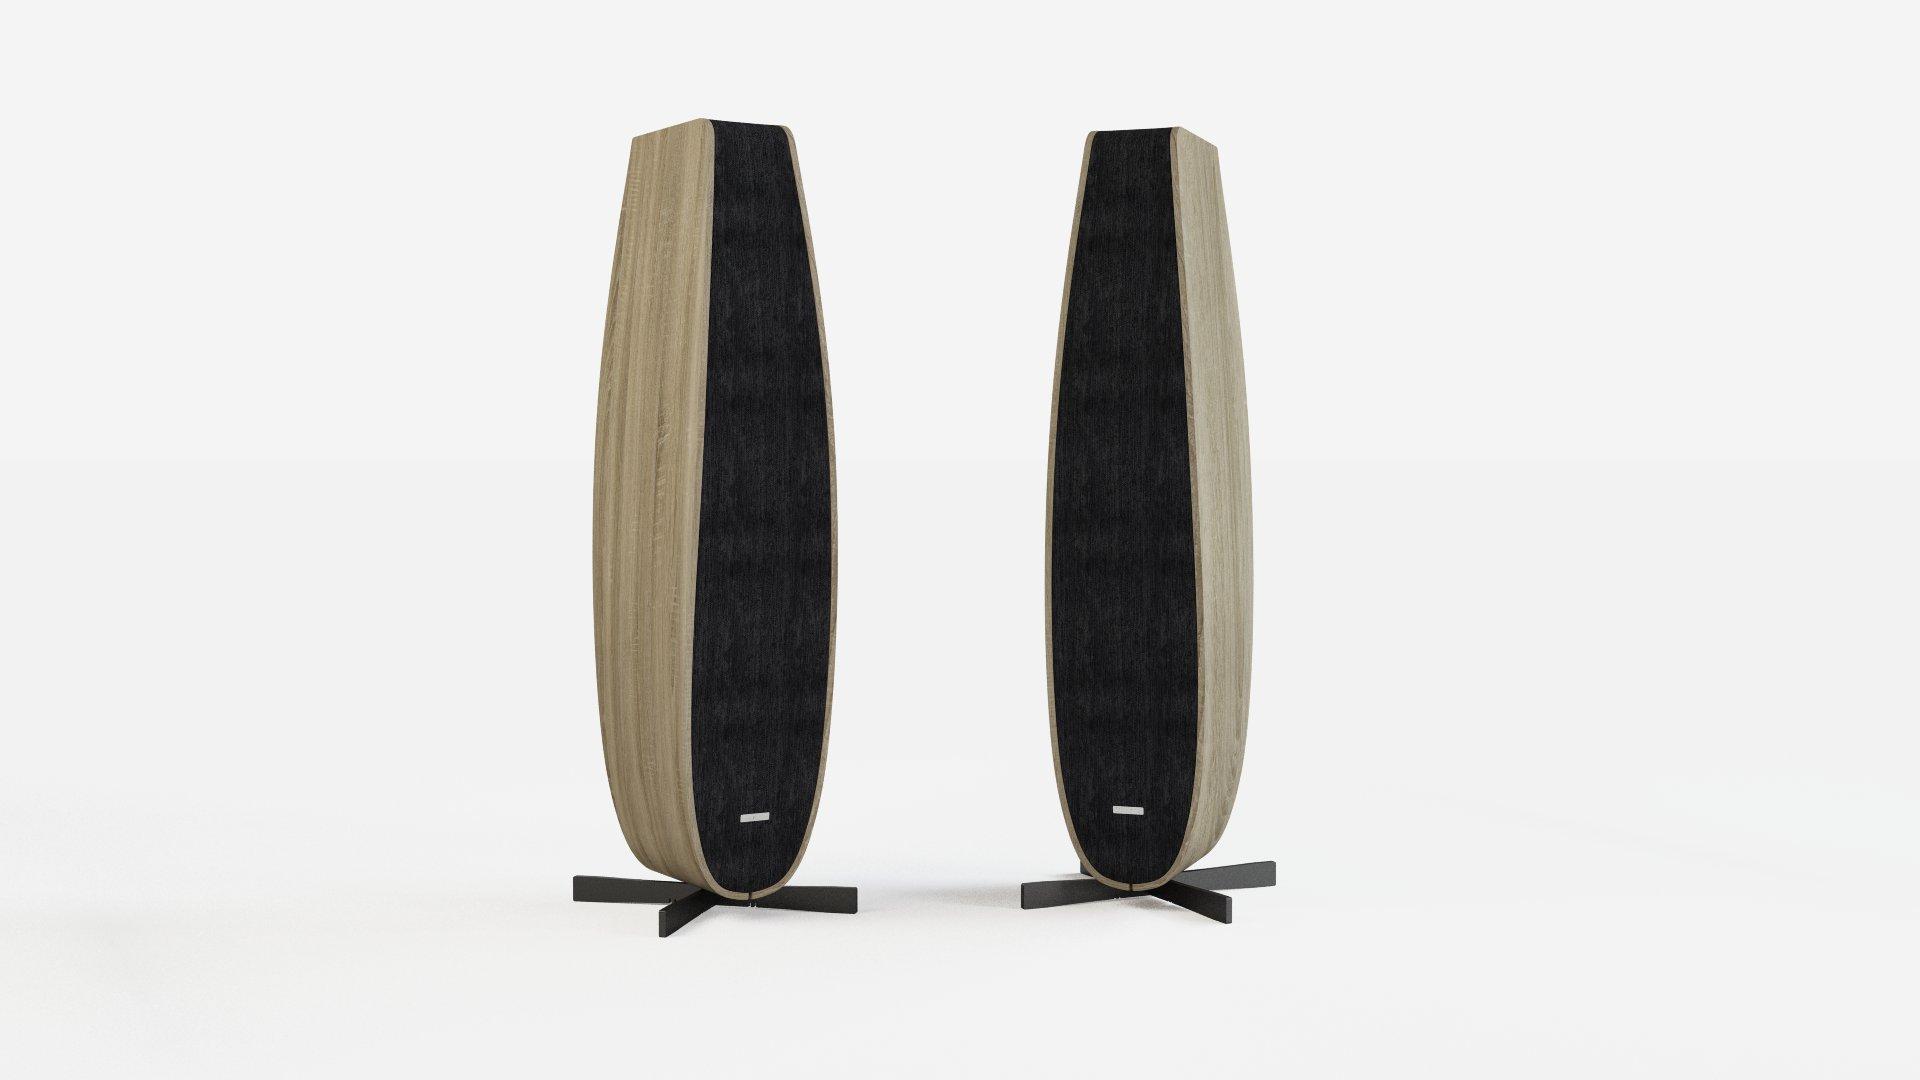 Davone speaker